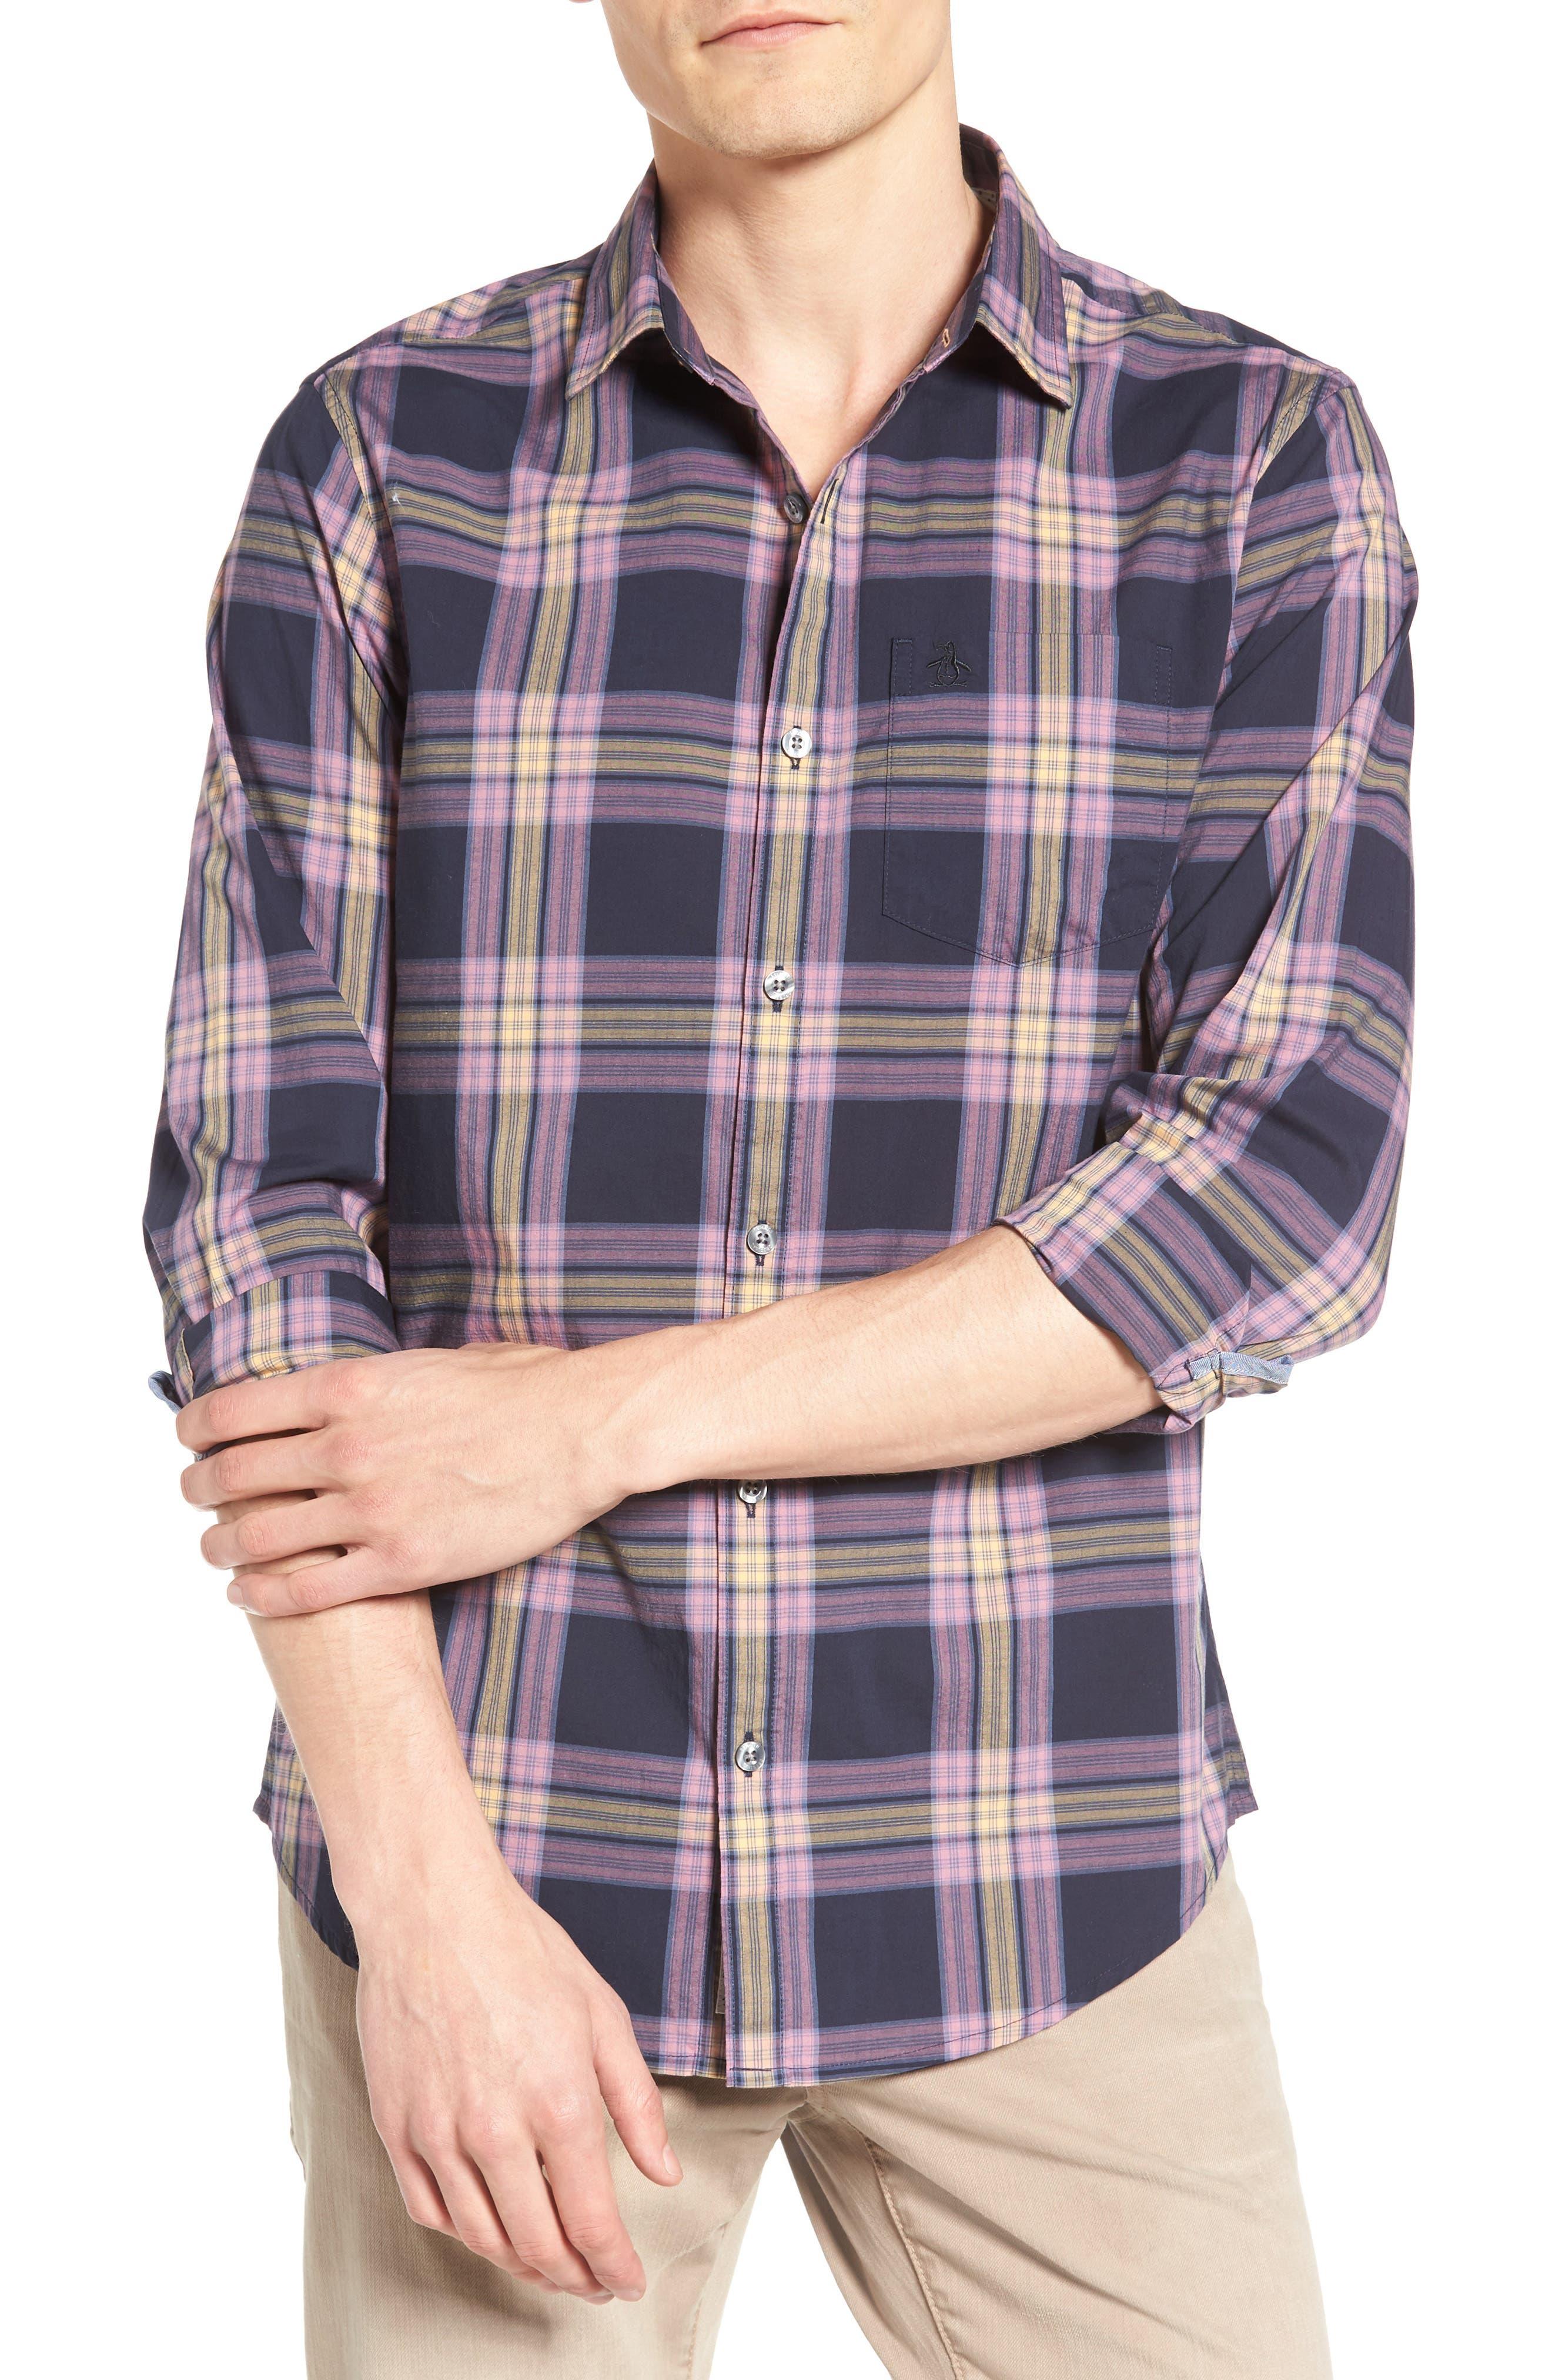 Main Image - Original Penguin Heritage Slim Fit Plaid Woven Shirt